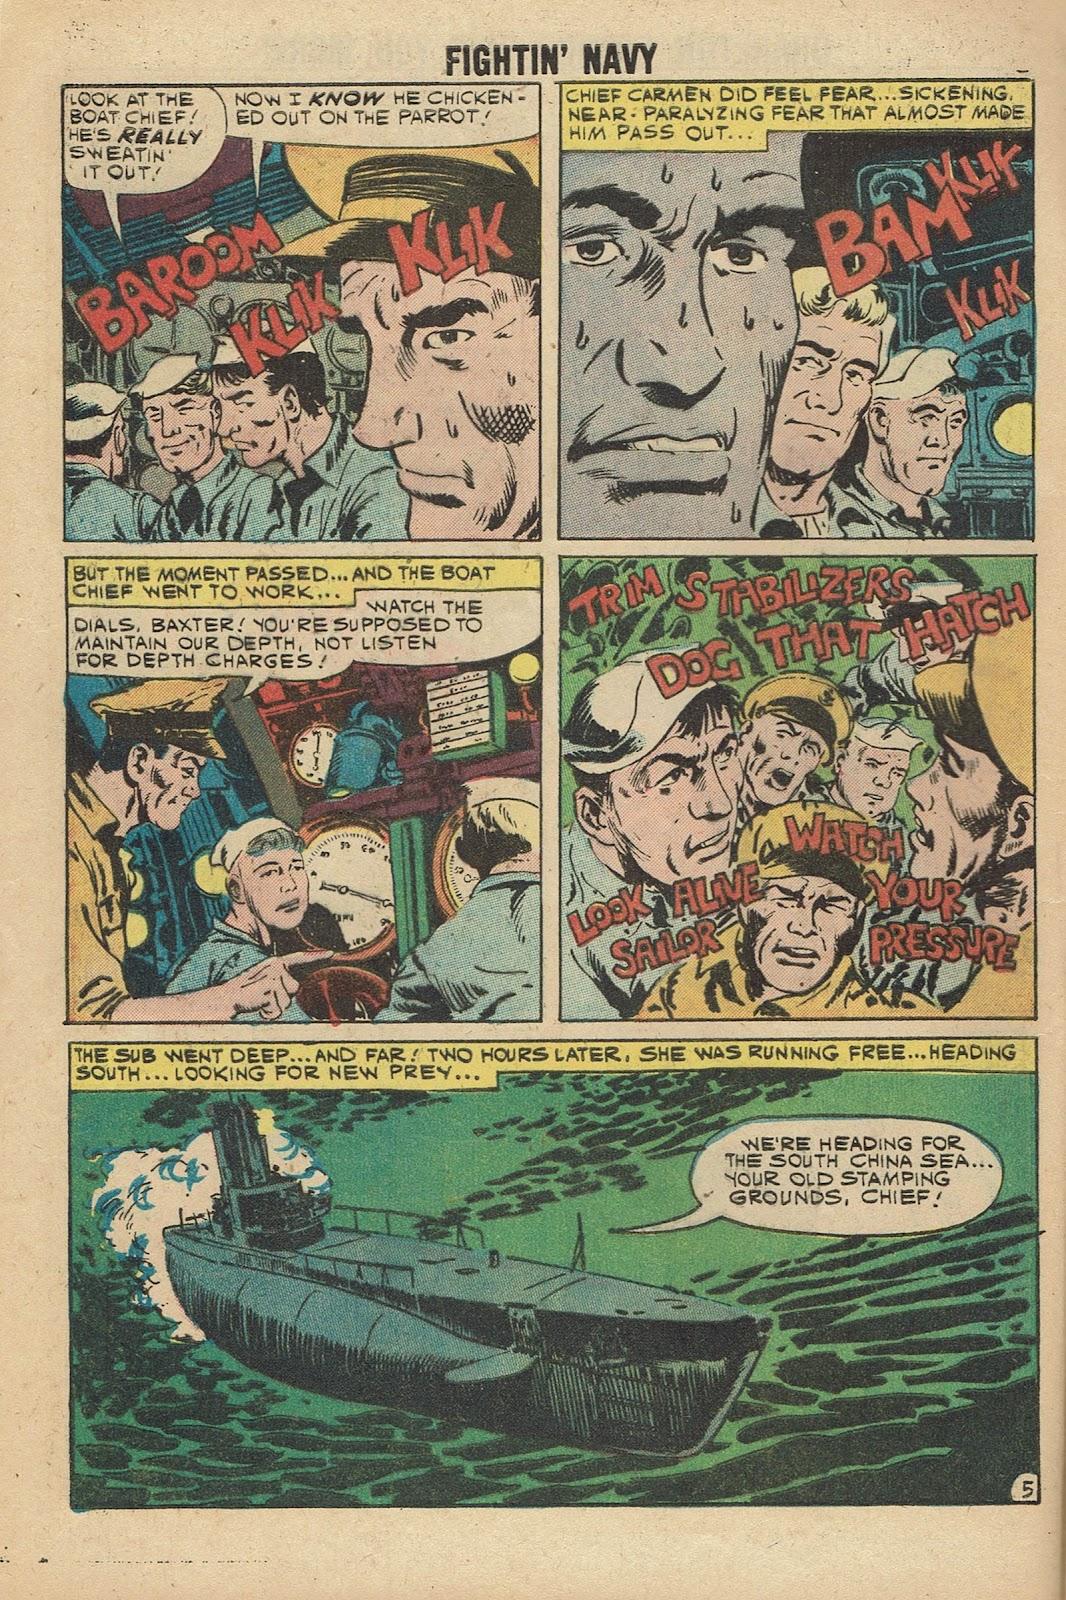 Read online Fightin' Navy comic -  Issue #96 - 8